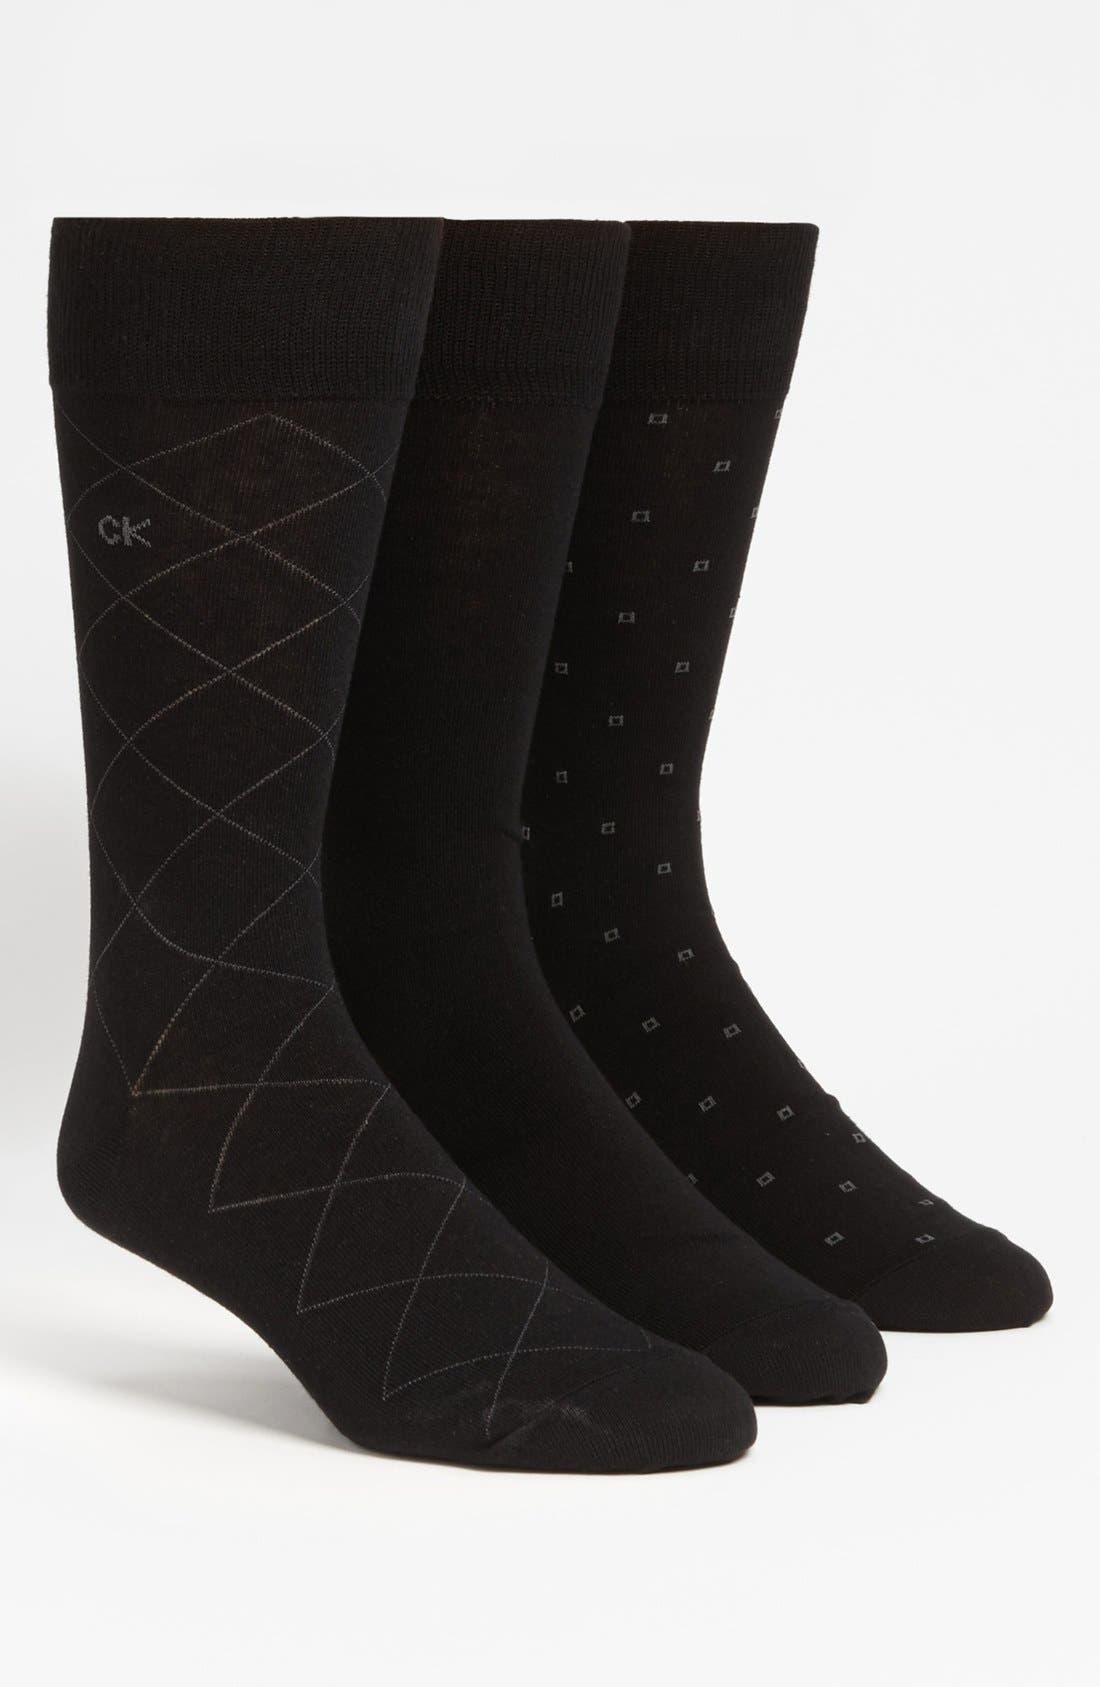 CALVIN KLEIN, 3-Pack Patterned Socks, Main thumbnail 1, color, BLACK